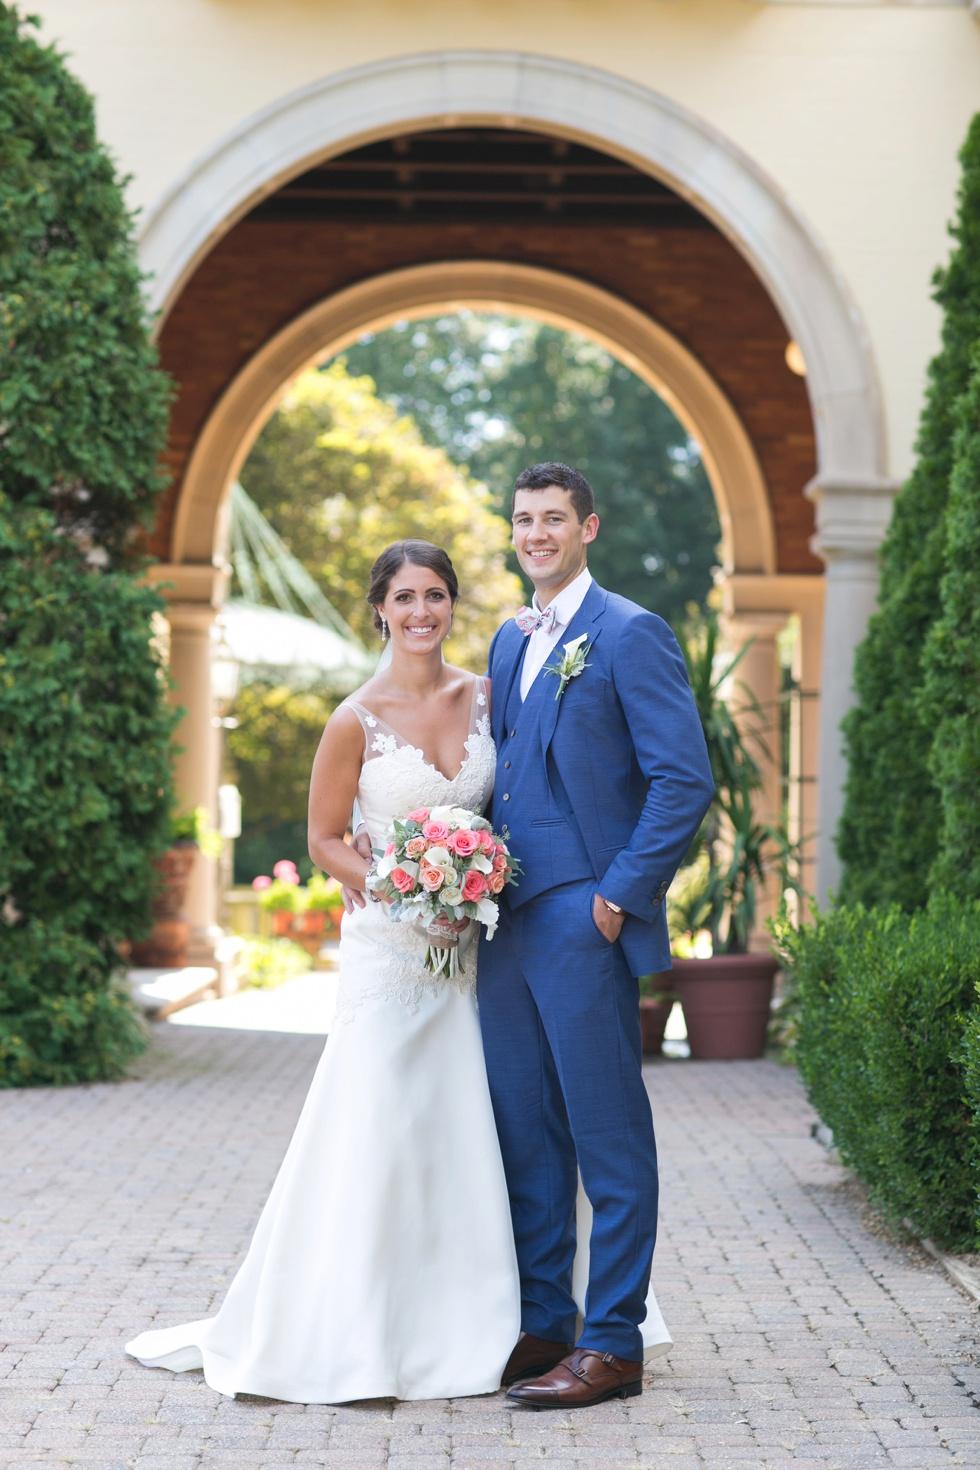 Evergreen Museum wedding - Best Wedding photographer of 2015